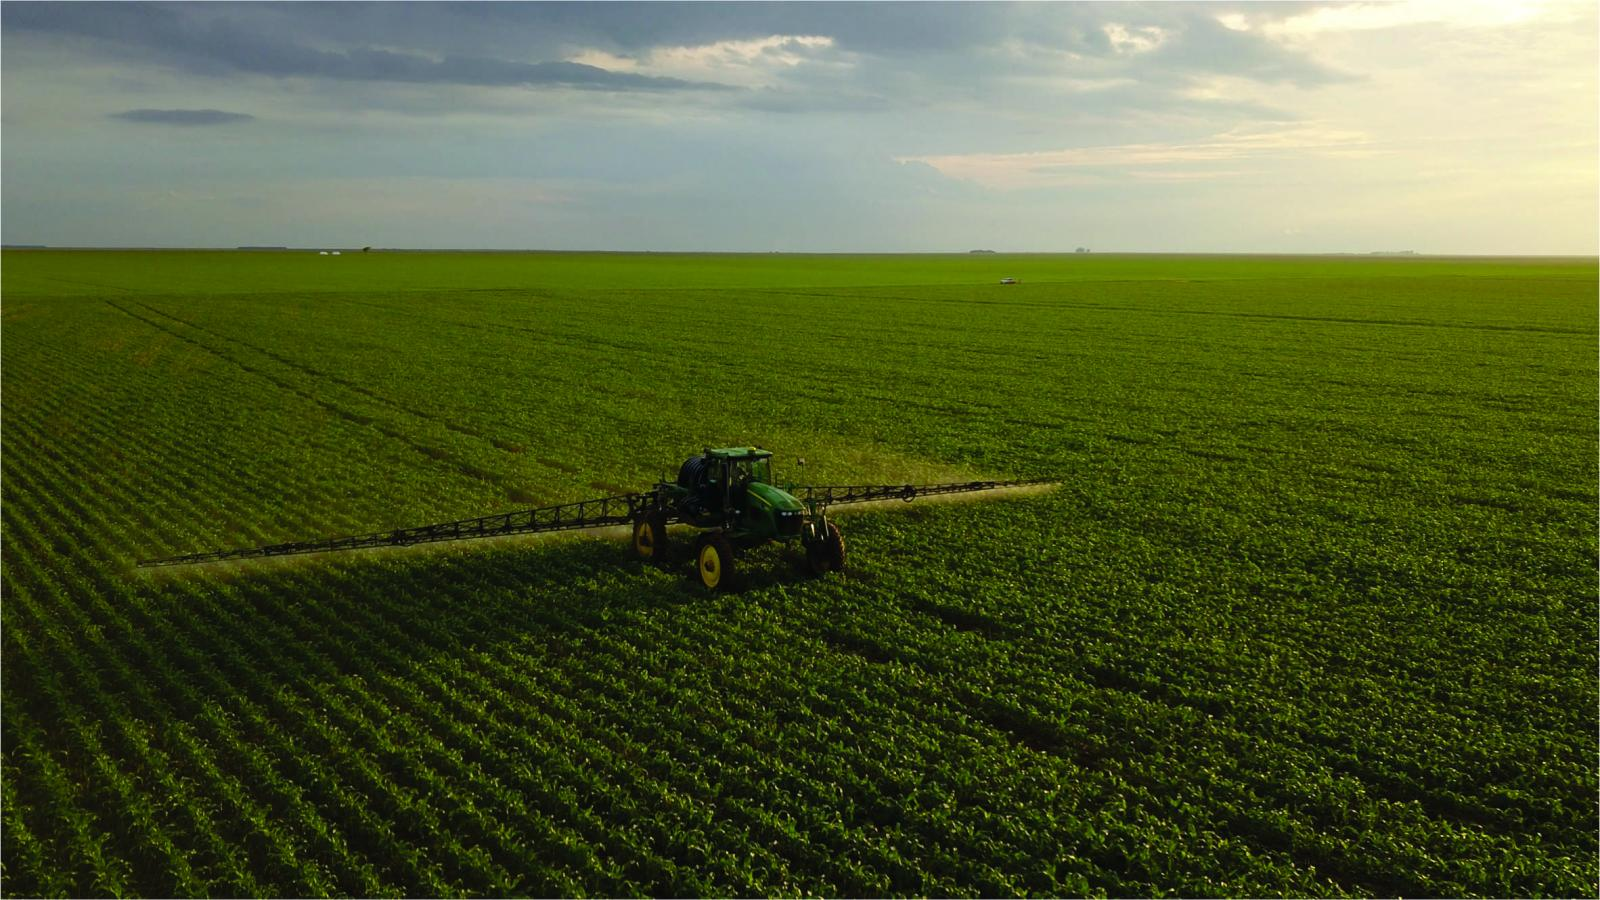 images/2018/04/carroll-farms-farmstead-45-gb1-1523484416mtuymzq4ndqxng.jpg